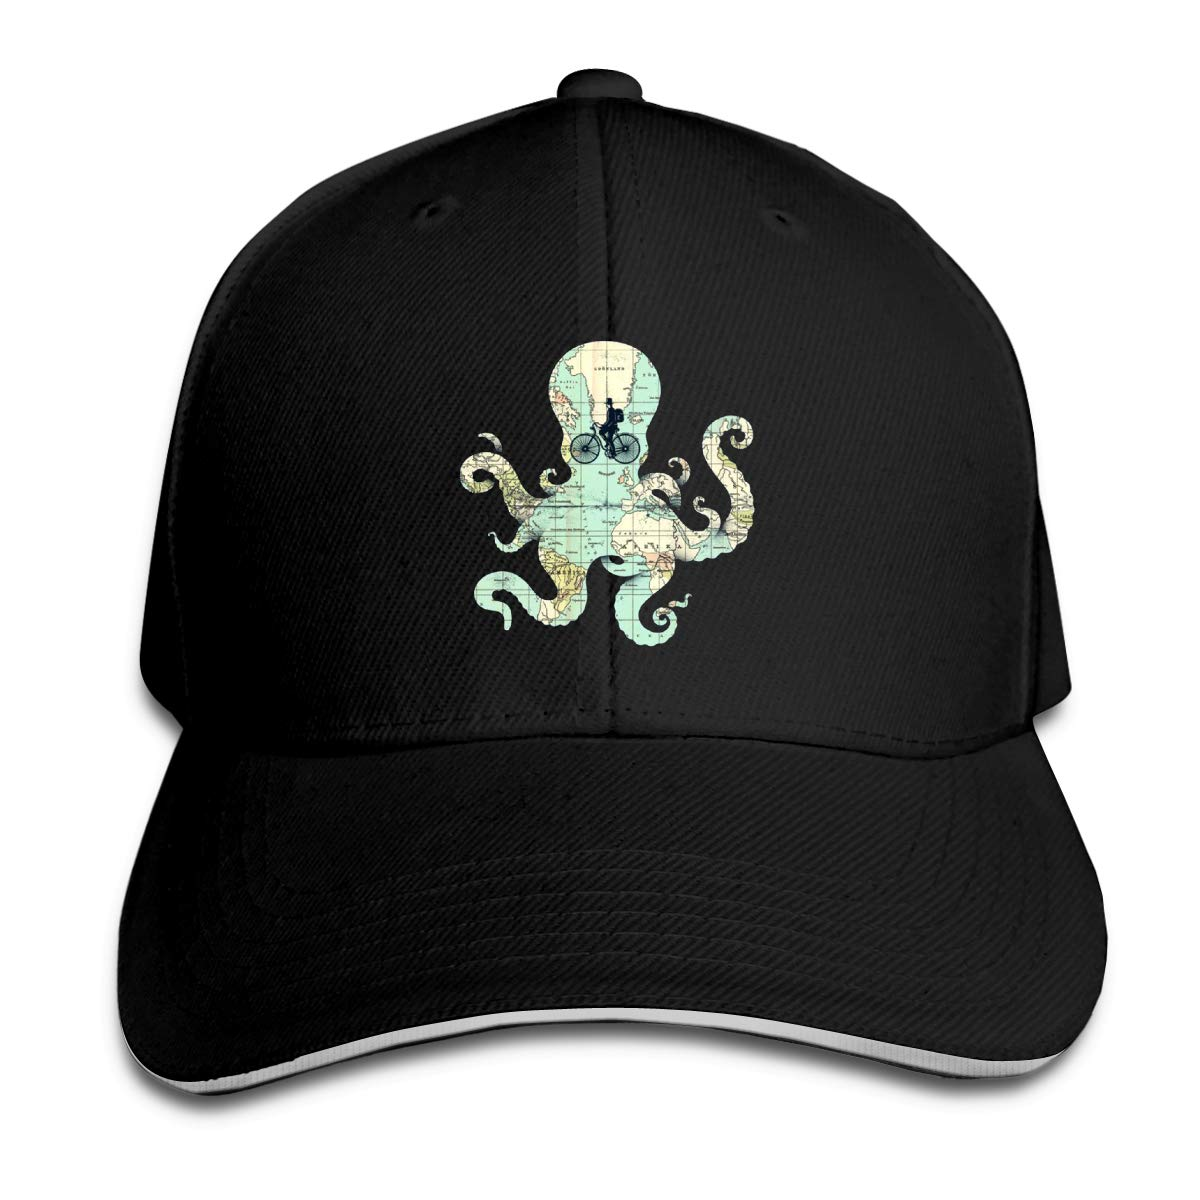 Octopus Map Classic Adjustable Cotton Baseball Caps Trucker Driver Hat Outdoor Cap Black